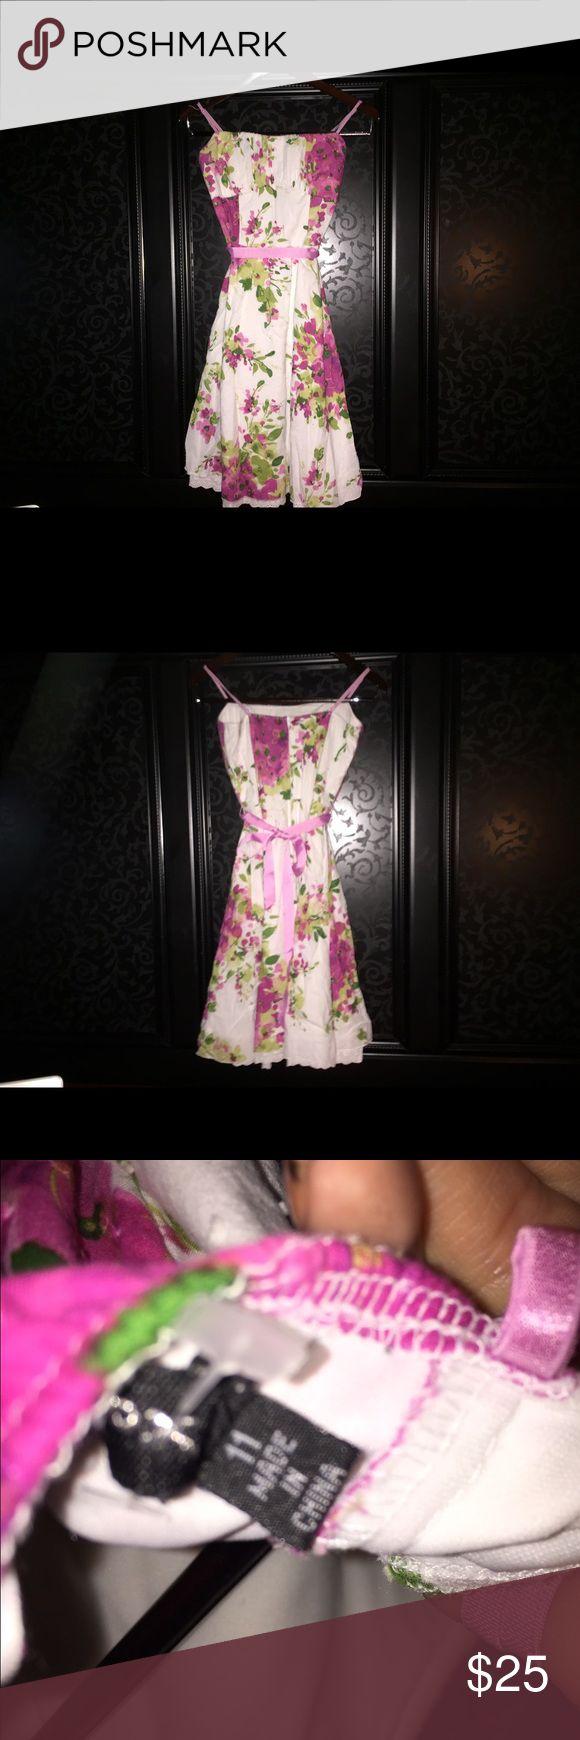 Size 11 women's floral spaghetti strap dress Floral midi dress. Size 11. Adjustable spaghetti straps, zips up the back. Pink ribbon waist sincher. Dresses Midi